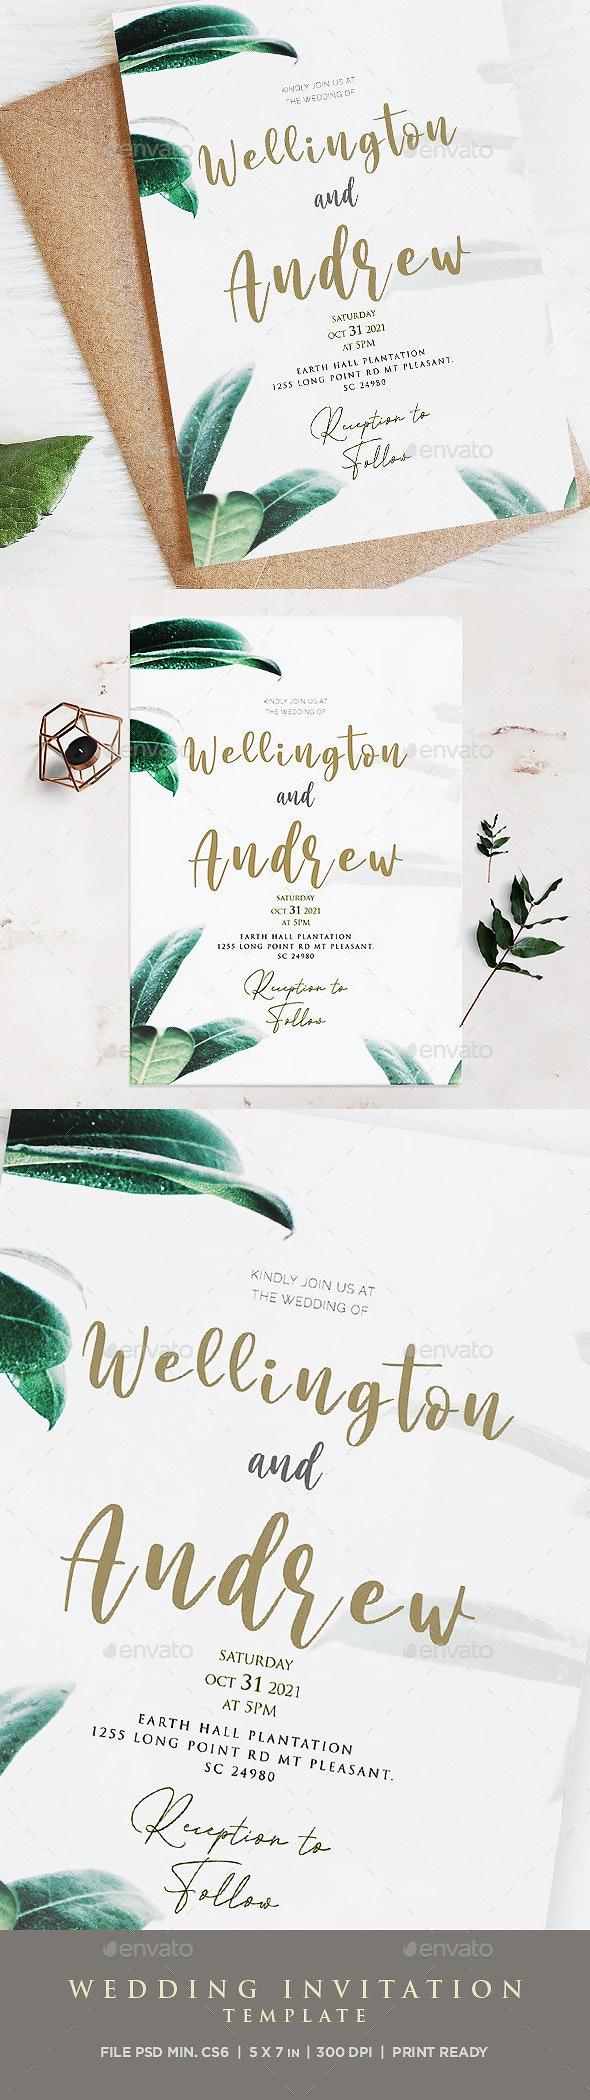 Greenery Wedding Eucalyptus Invitation - Weddings Cards & Invites